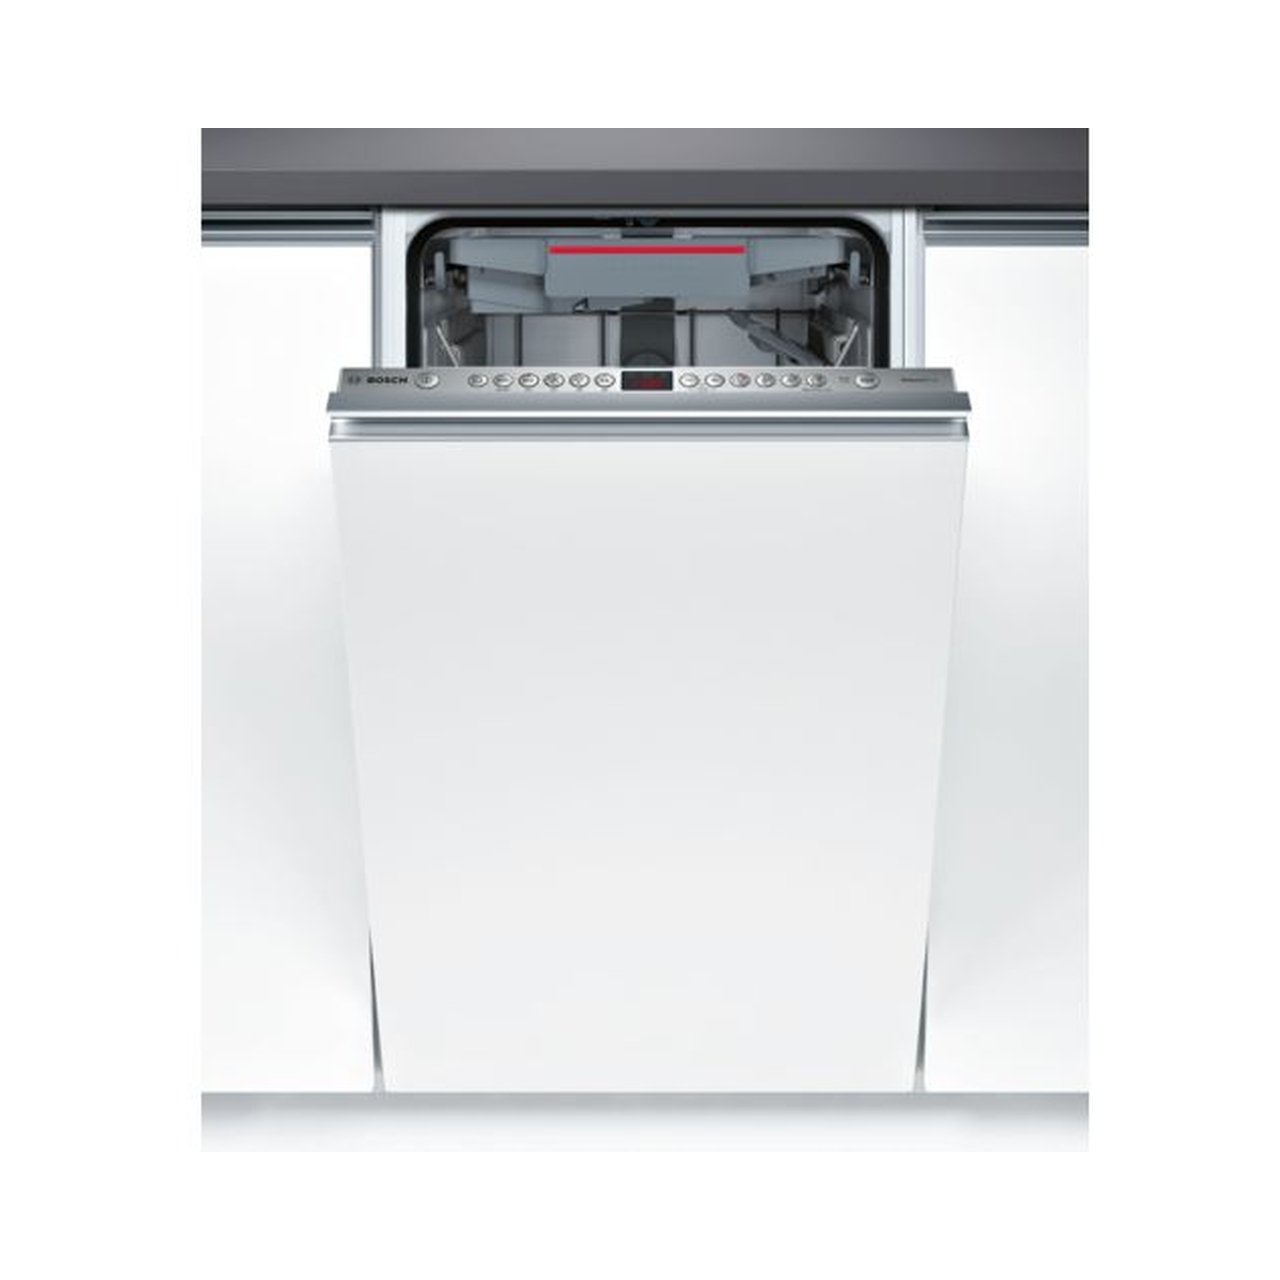 Máy rửa bát âm tủ BOSCH SPV46MX00E Serie 4